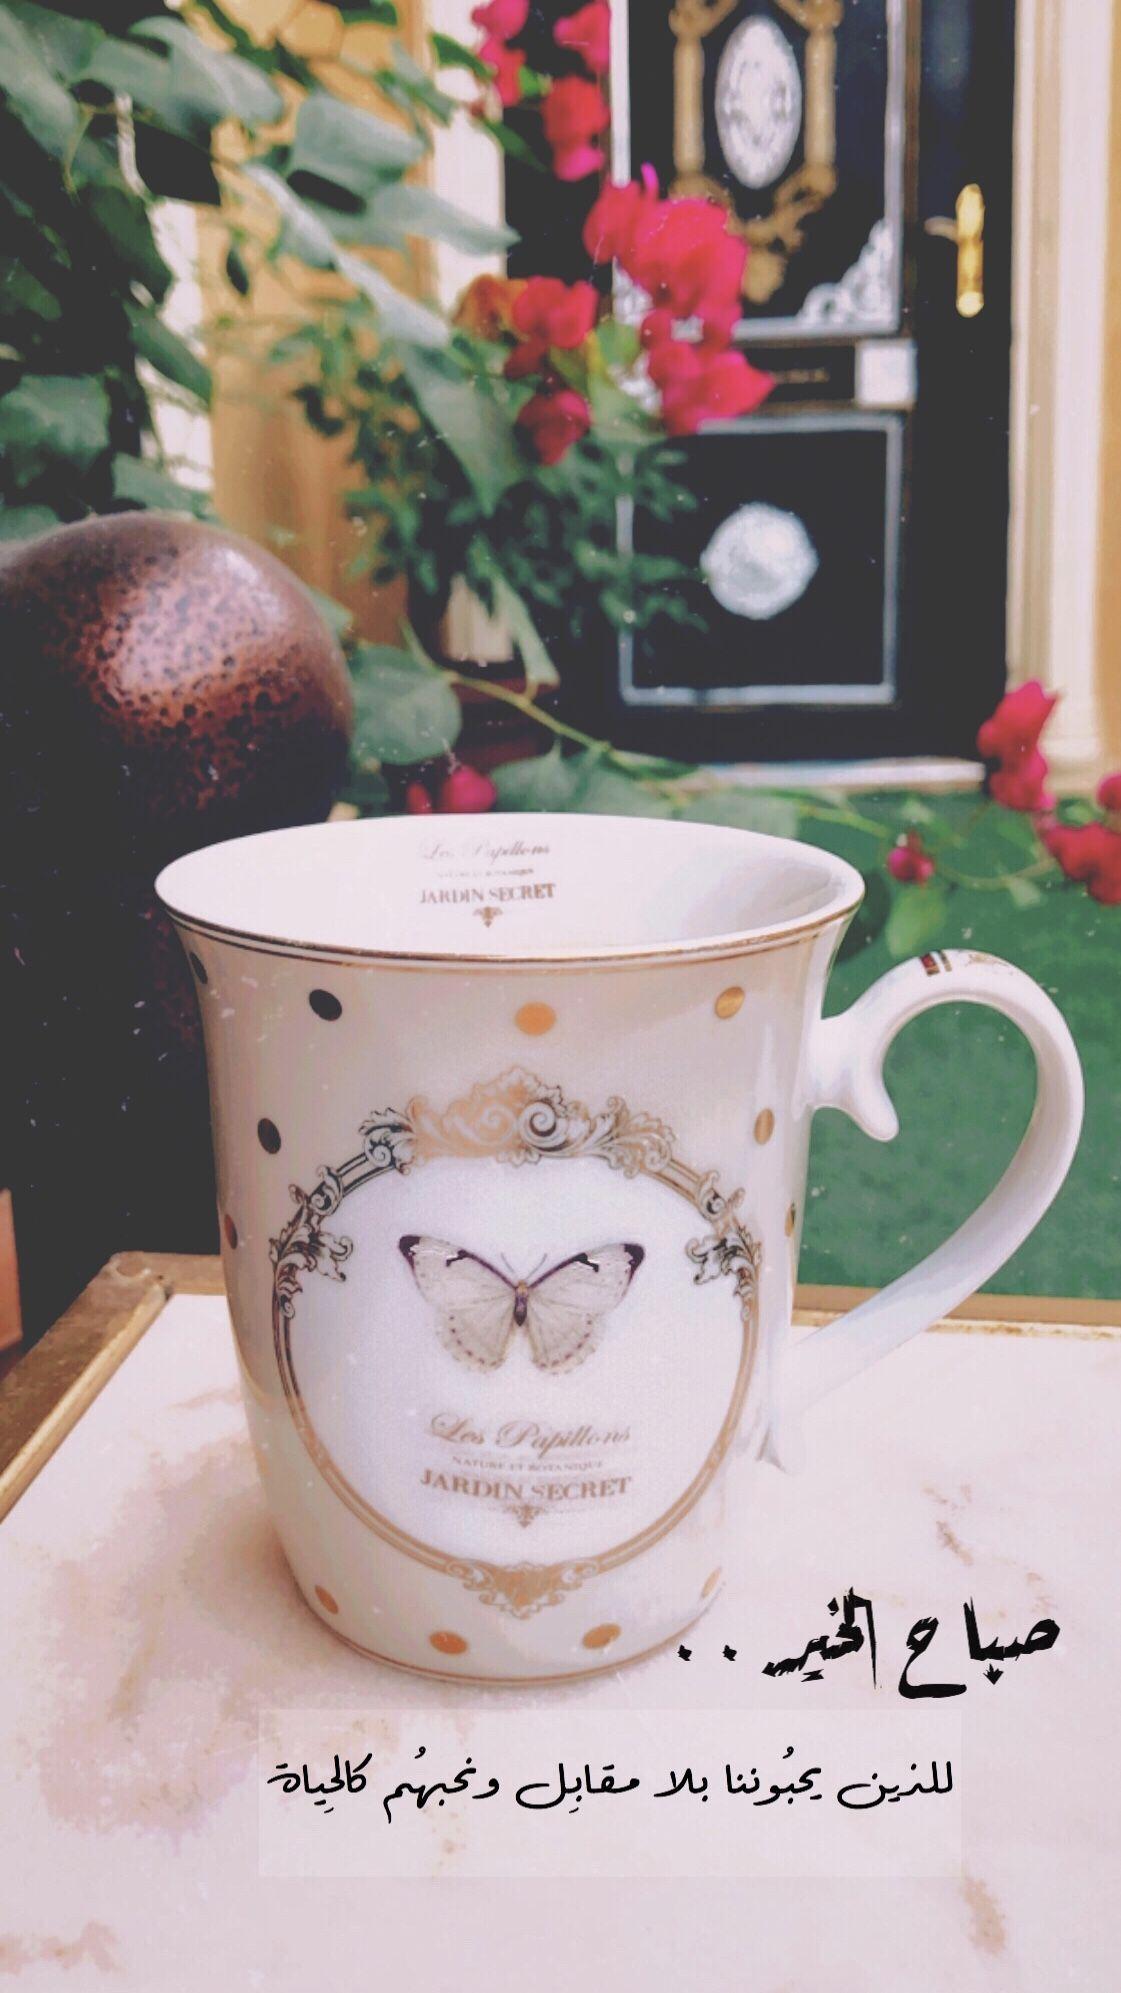 ياسمين Morning Love Quotes Good Morning My Love Sweet Love Quotes